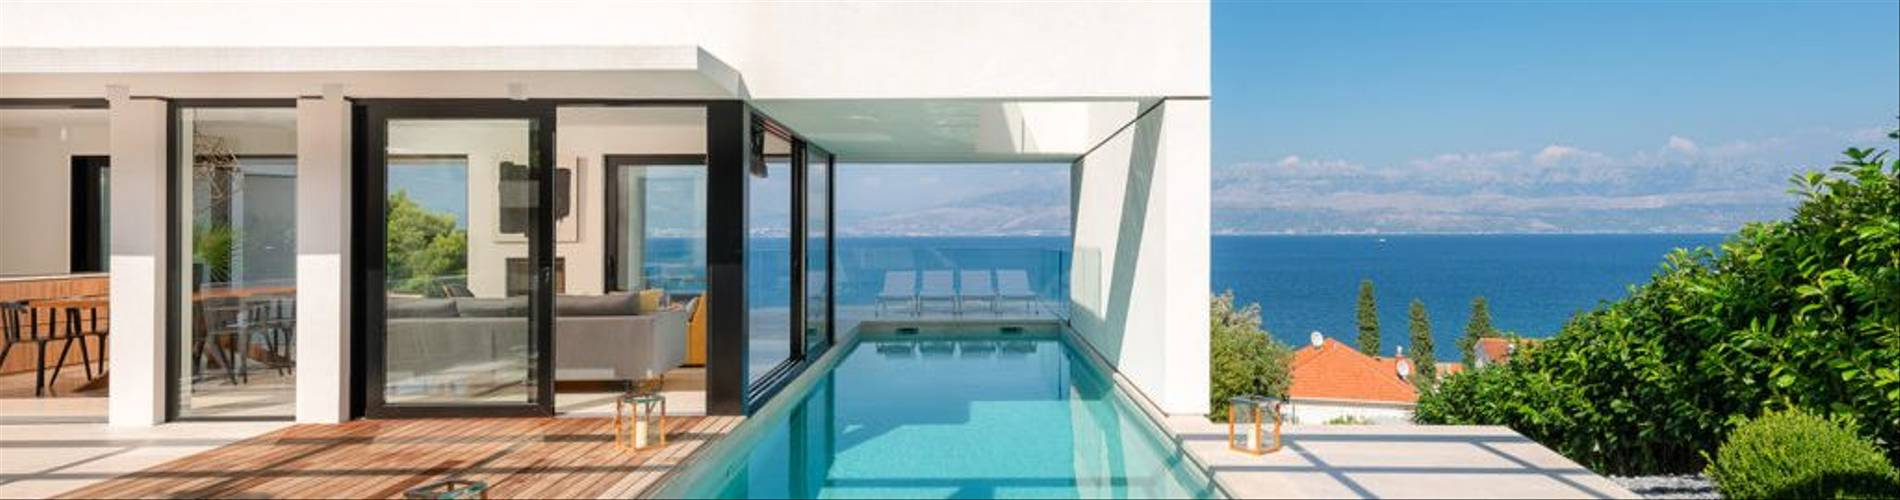 villa-cypres-sutivan-brac-012-1024x683.jpg